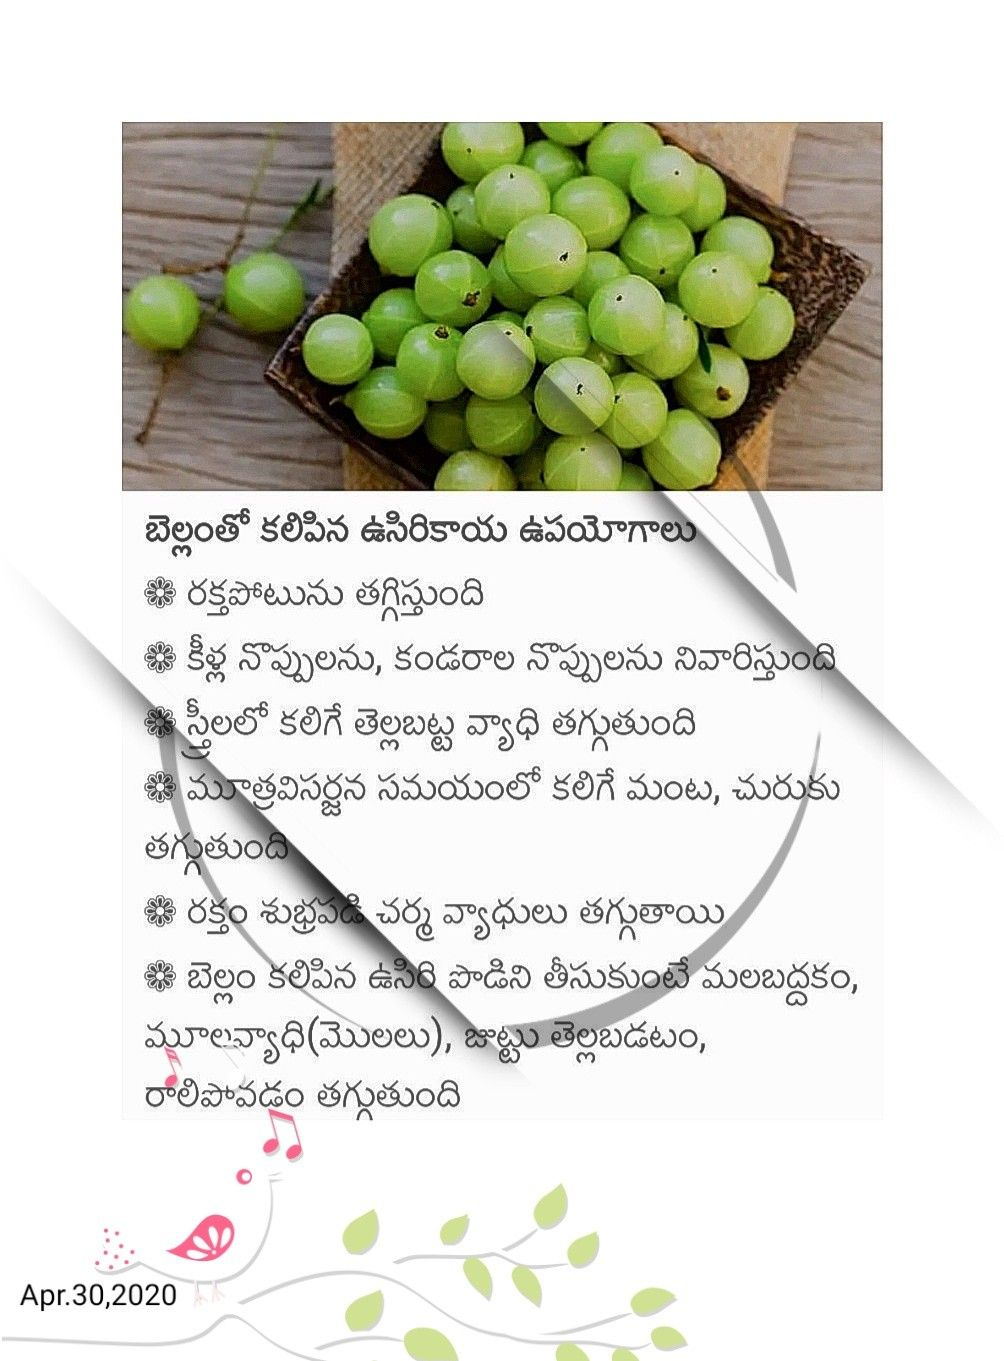 Pin on Telugu, Vasu, Chittoor